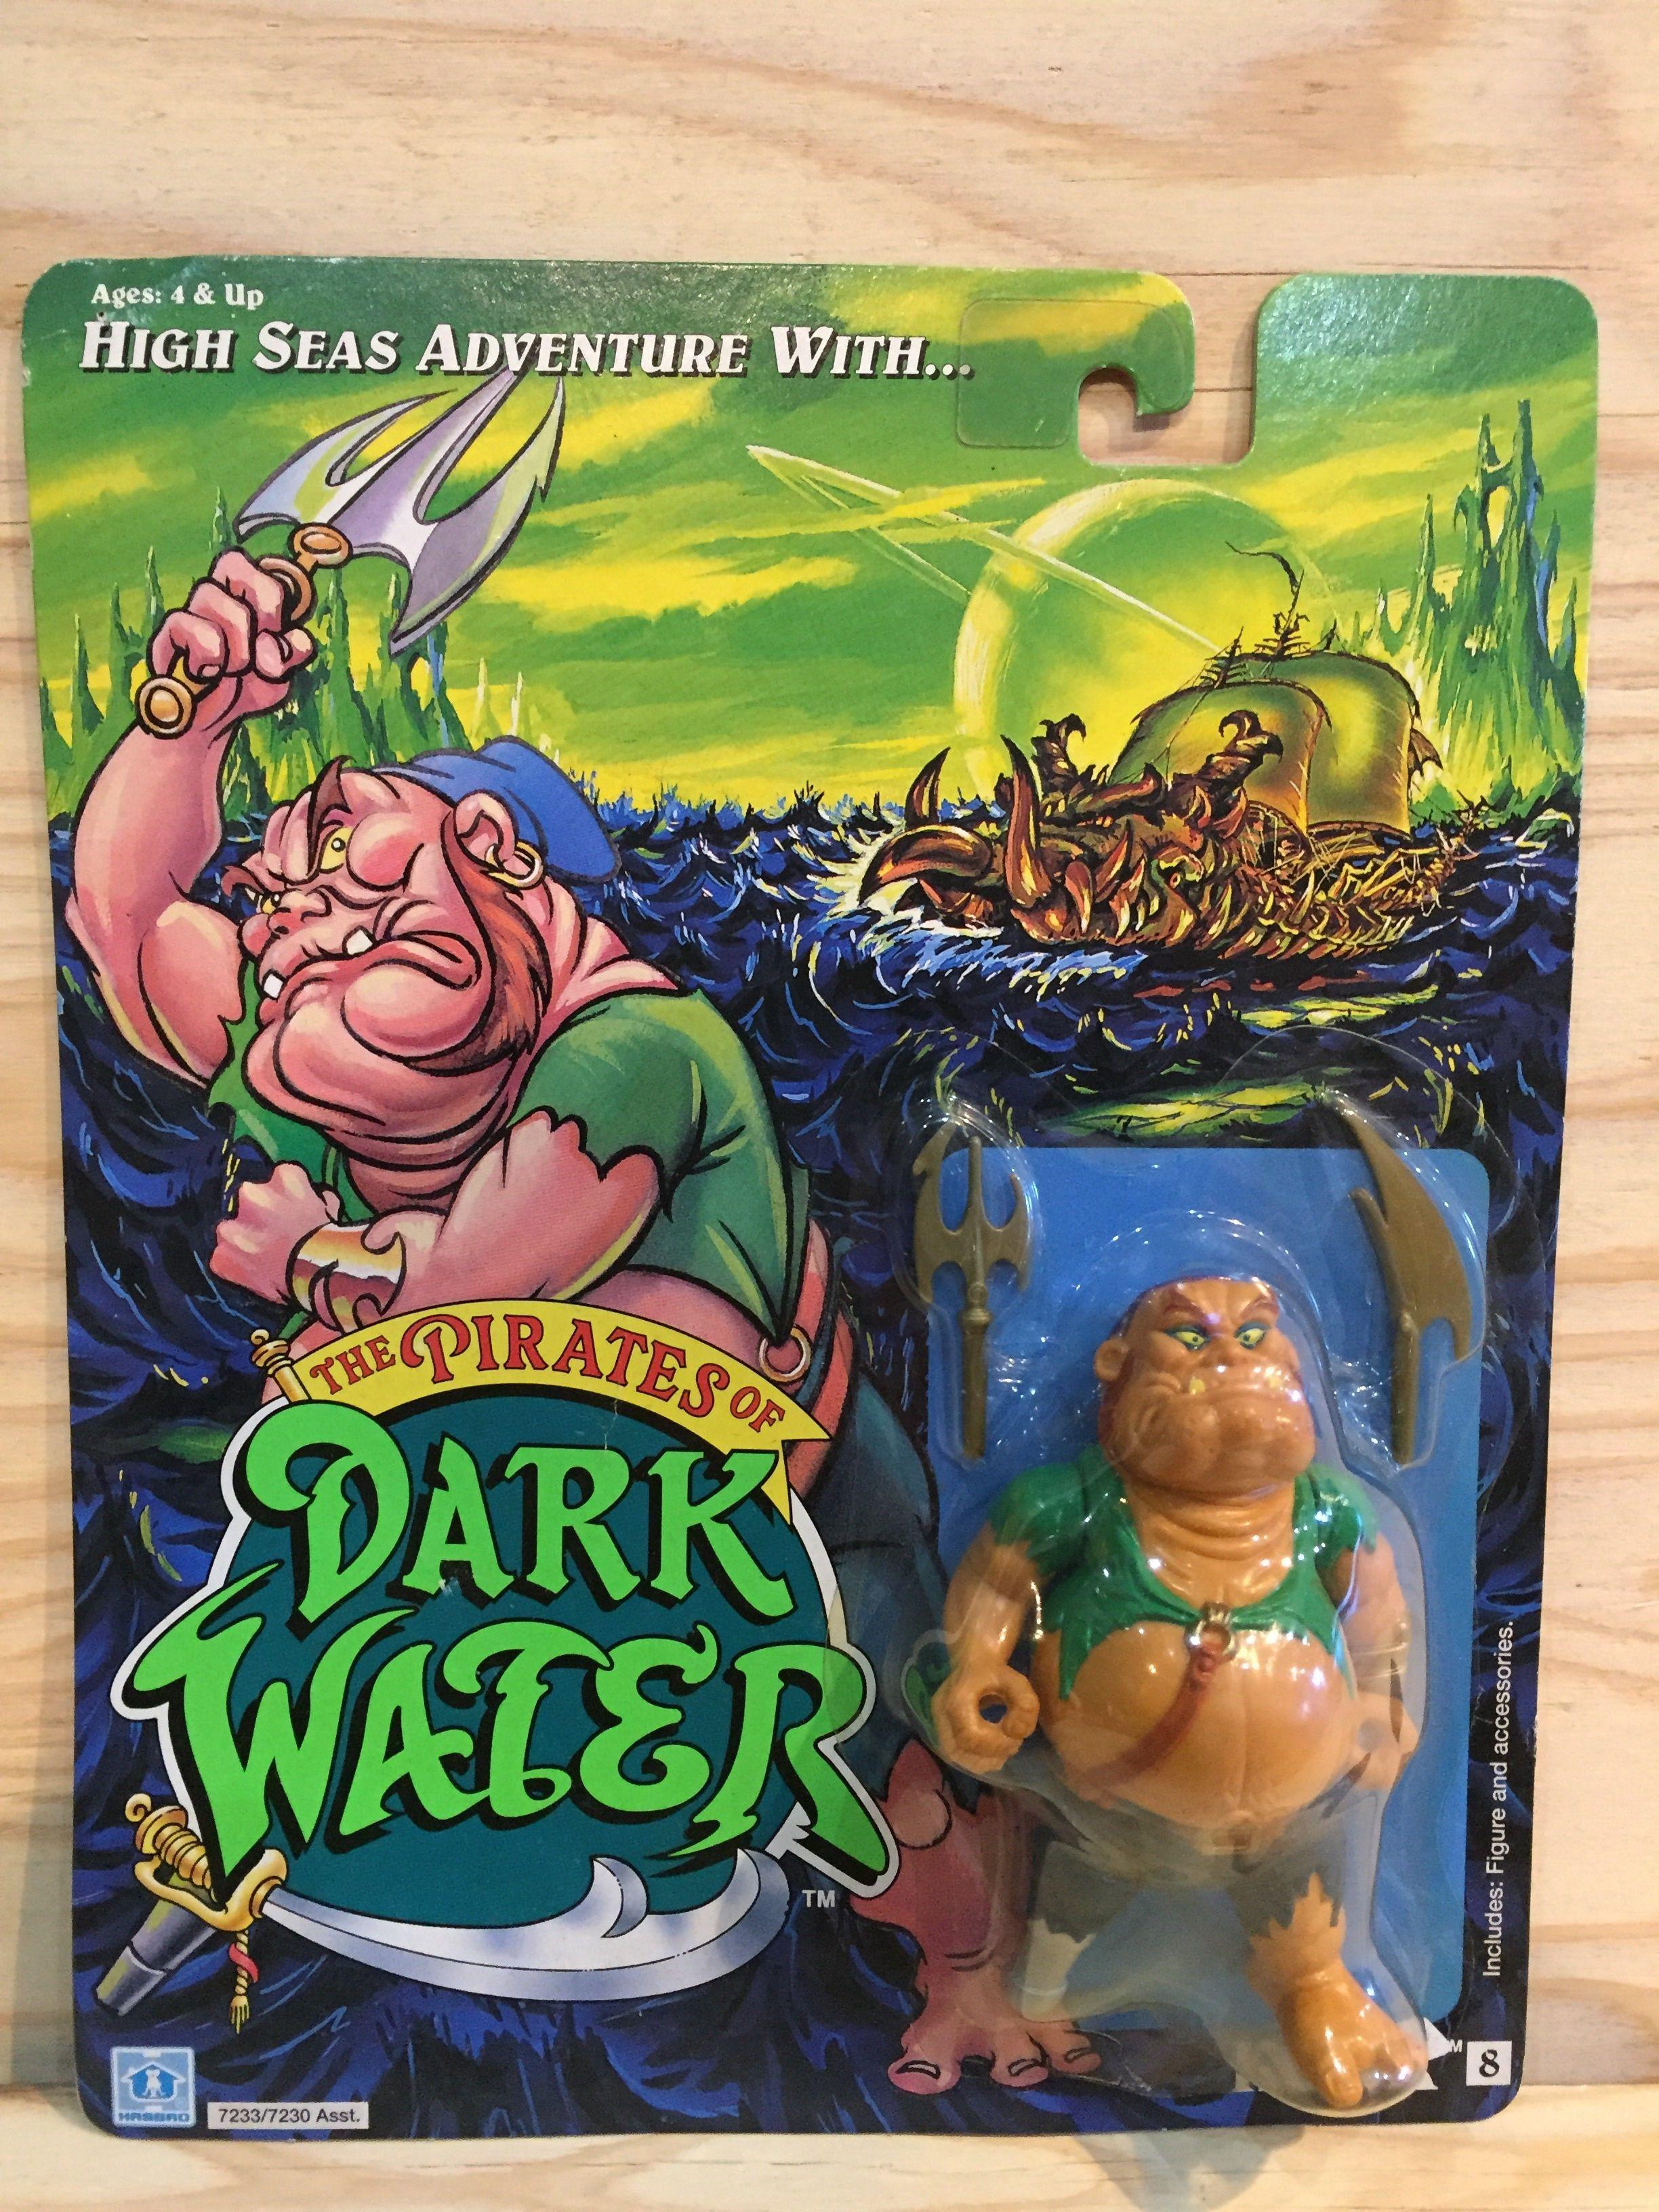 THE PIRATES OF DARK WATER(KONK)